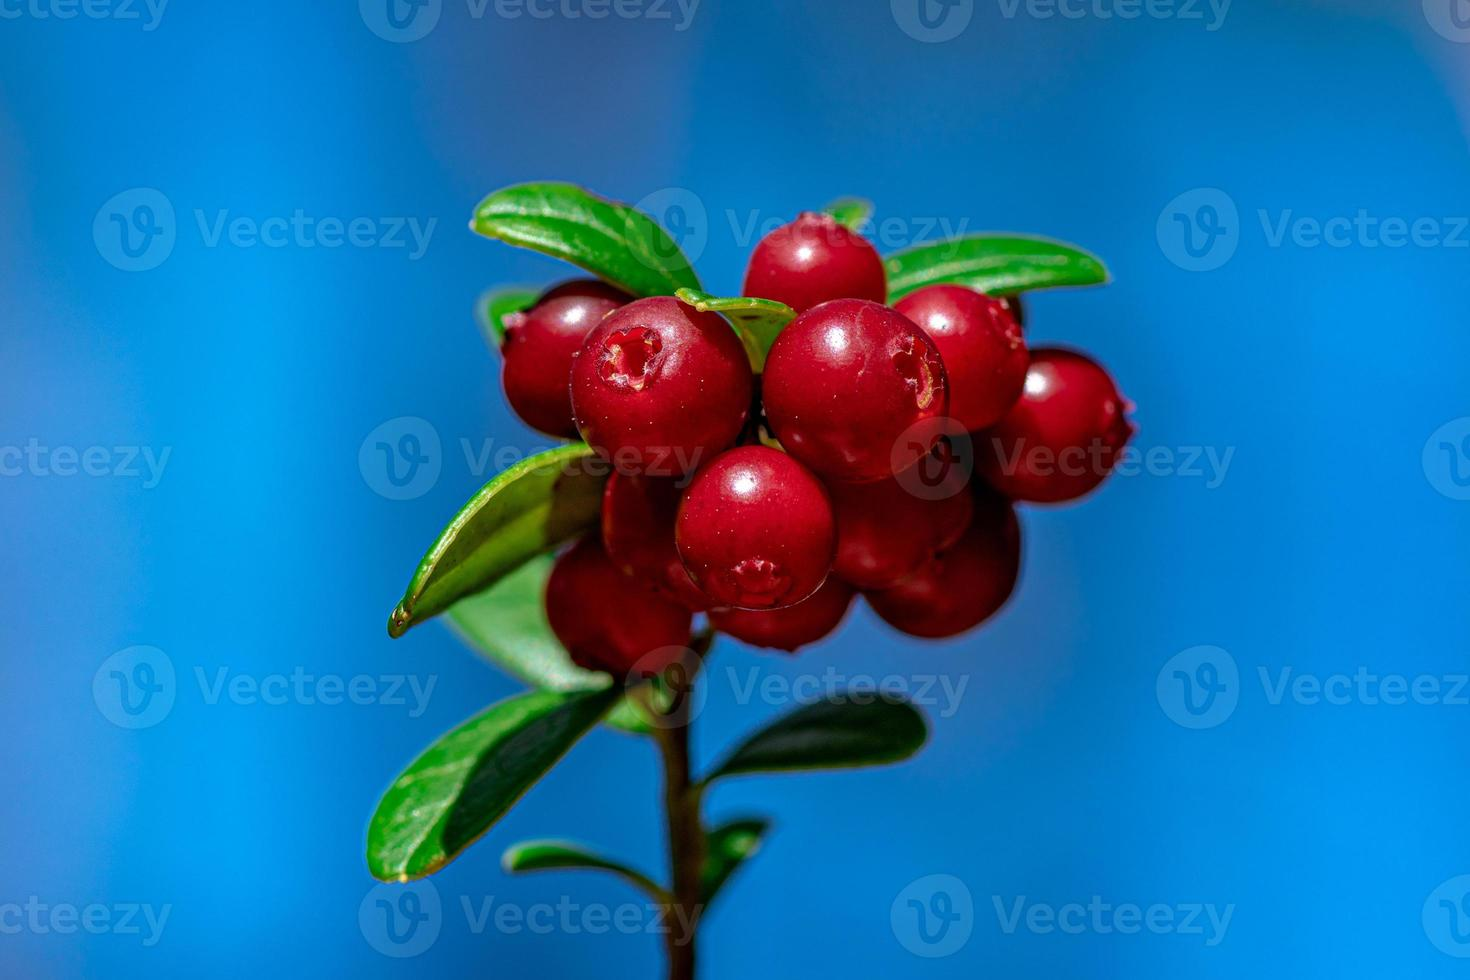 Lingon Beeren wachsen auf Zweig foto